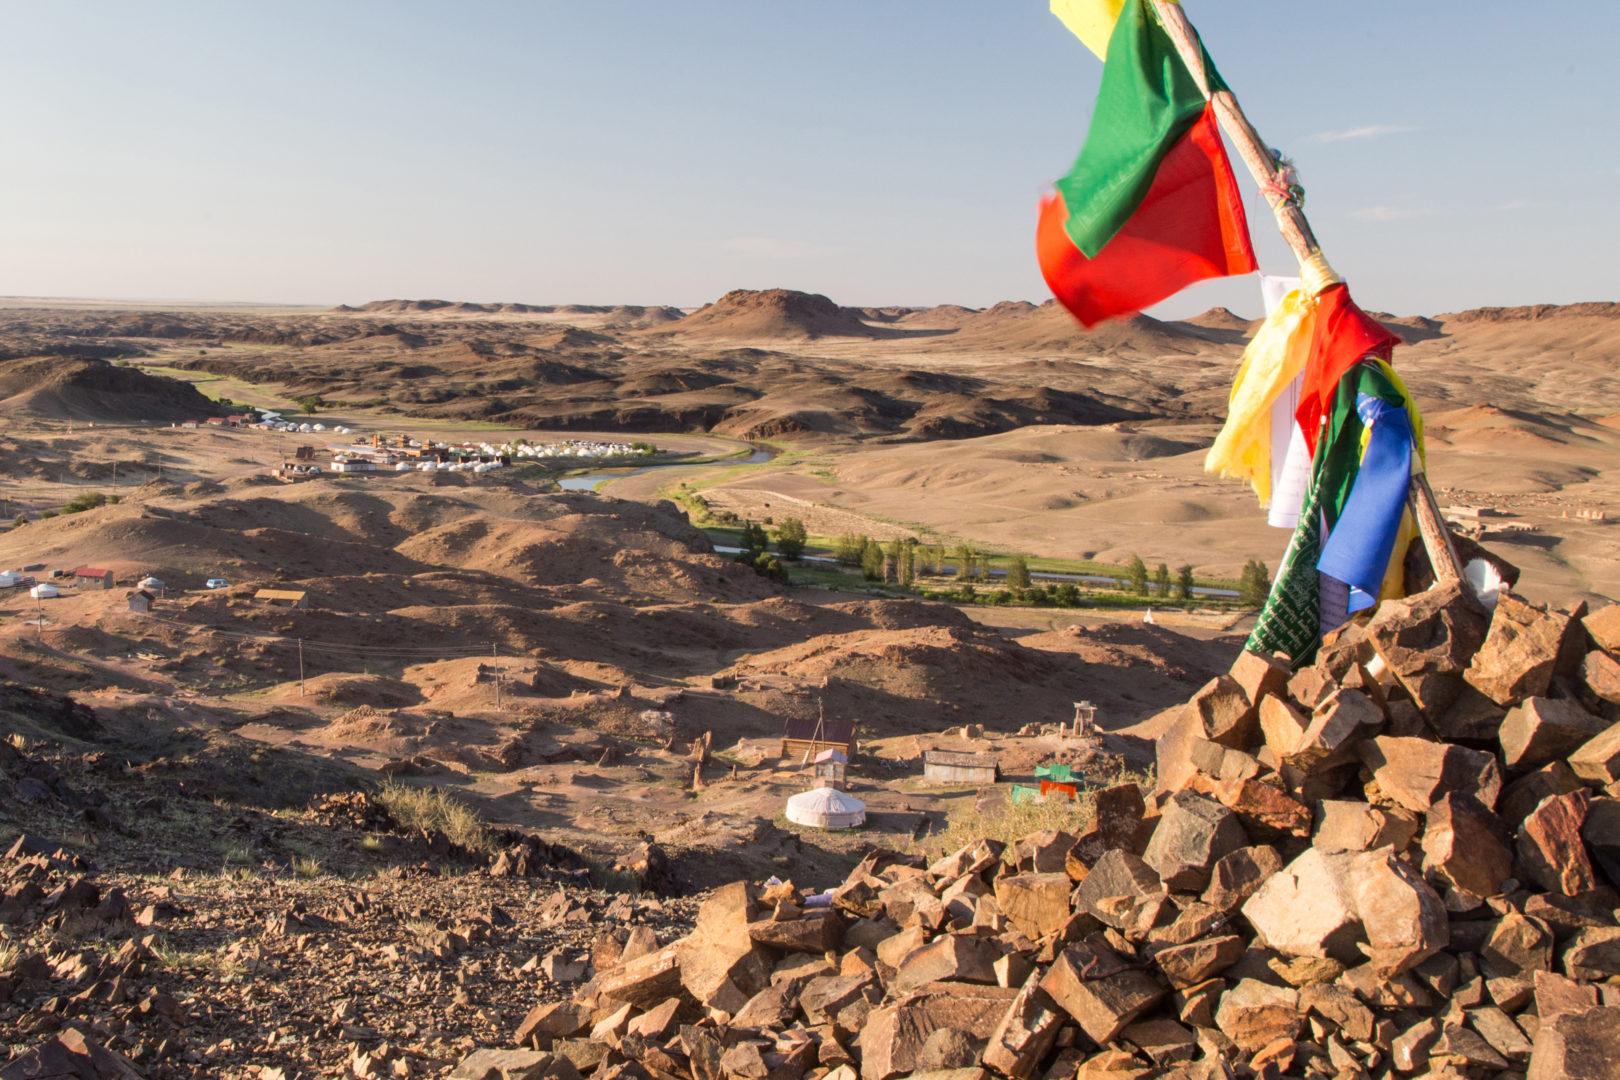 Ongi-Fluss in der Wüste Gobi